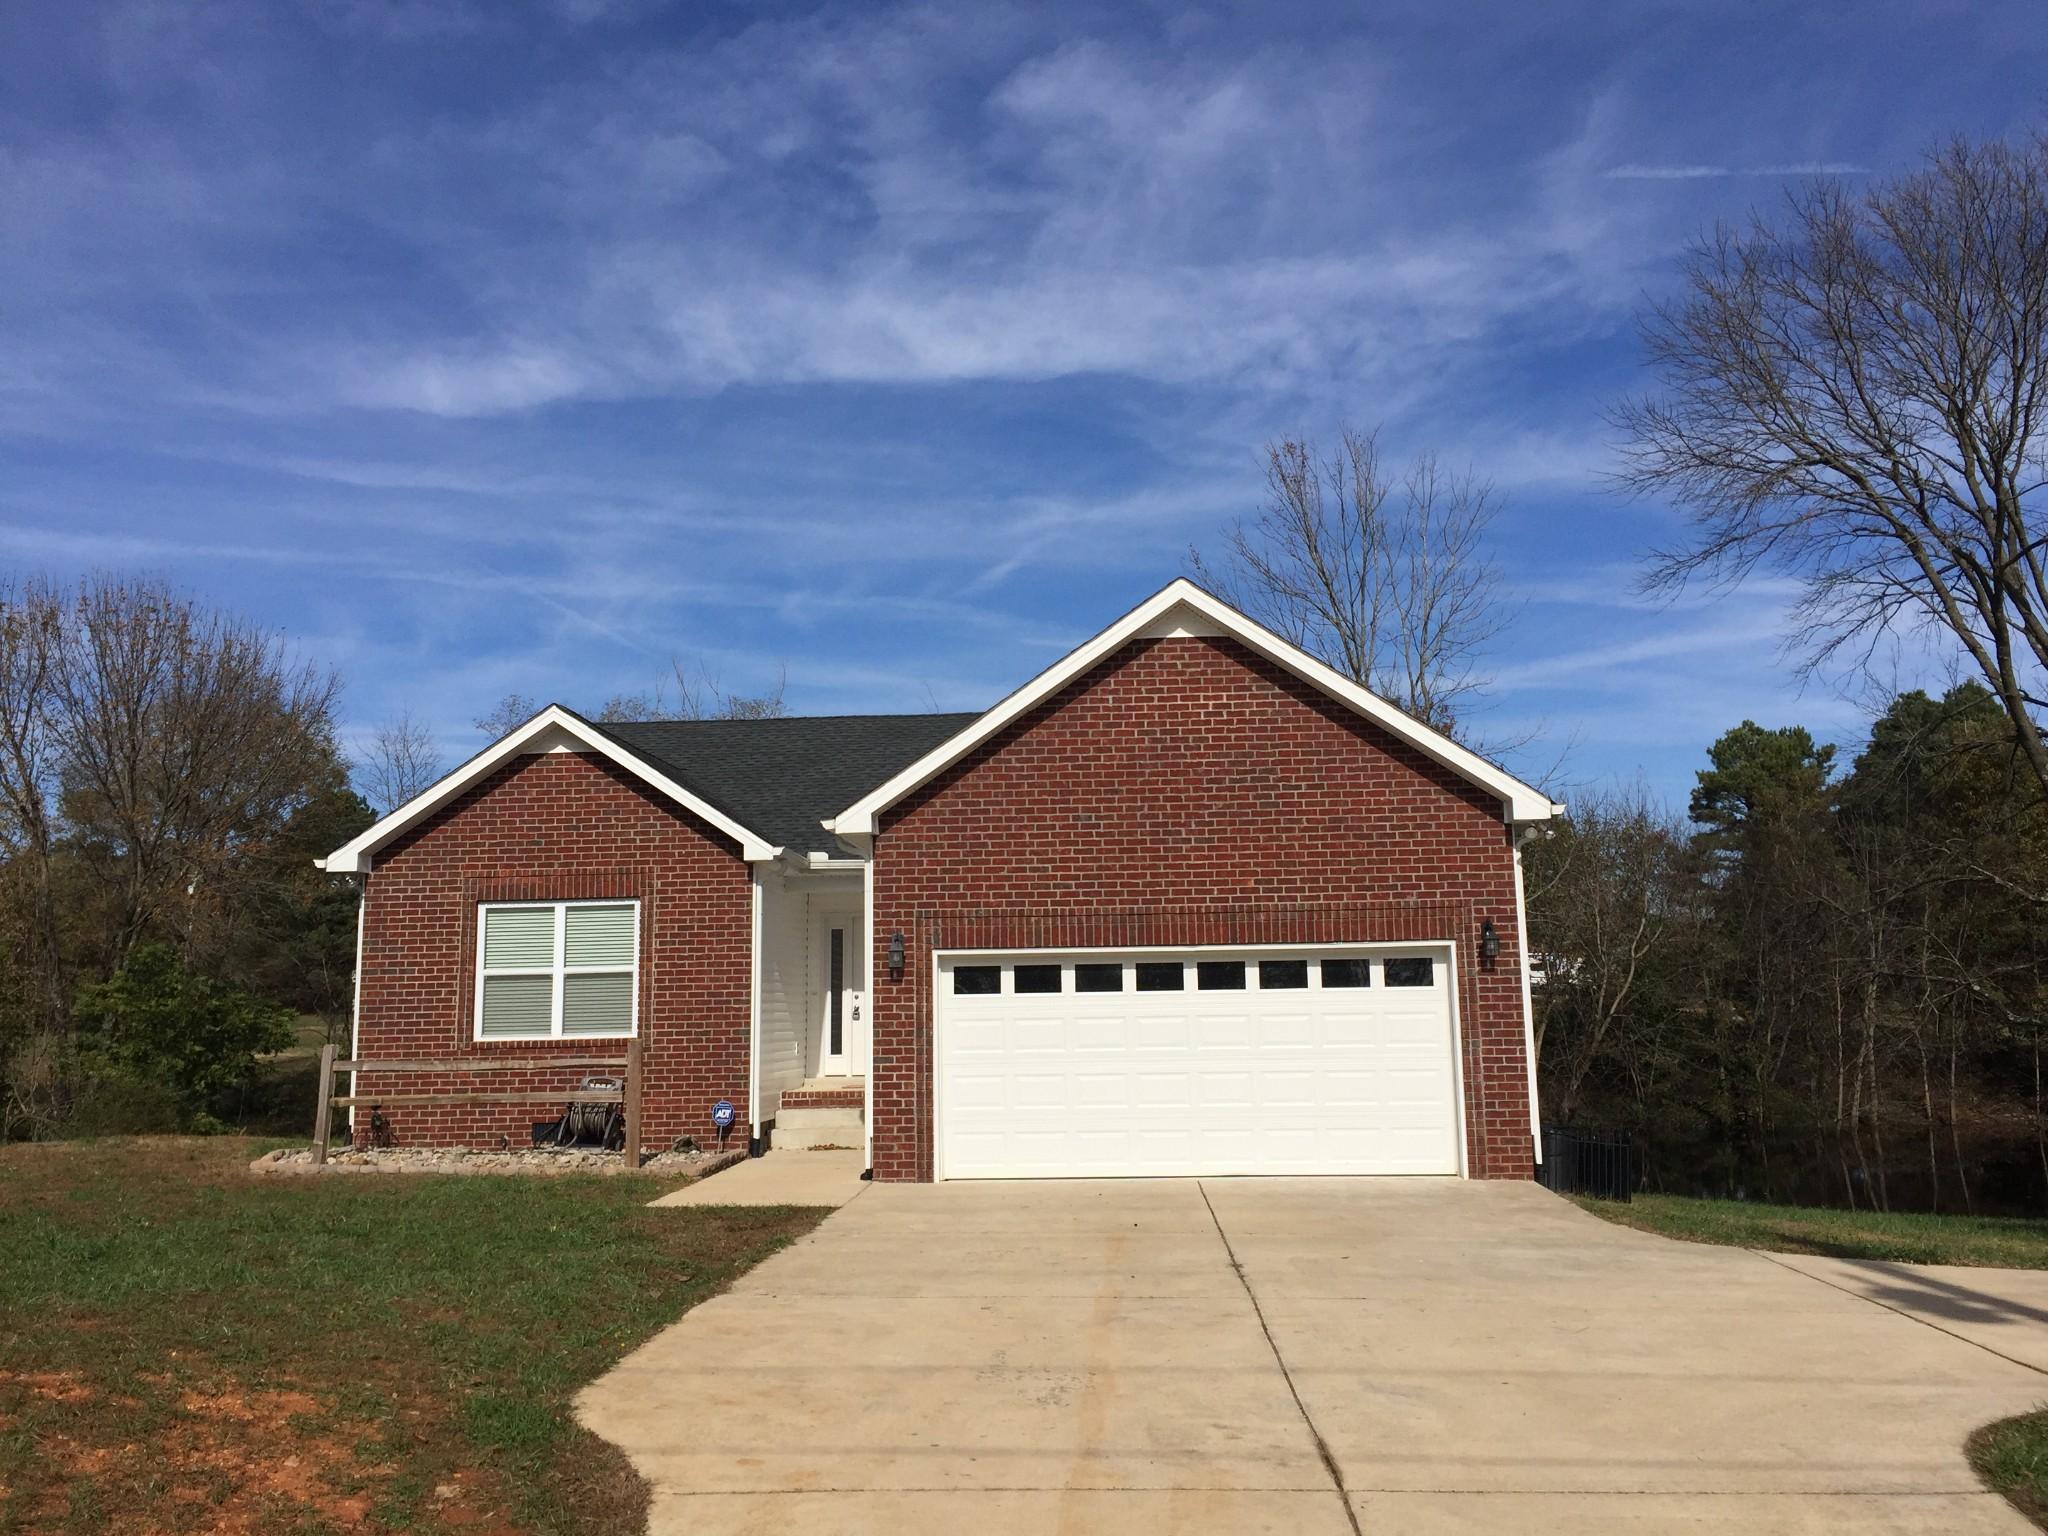 8386 Hwy 52, Orlinda, TN 37141 - Orlinda, TN real estate listing